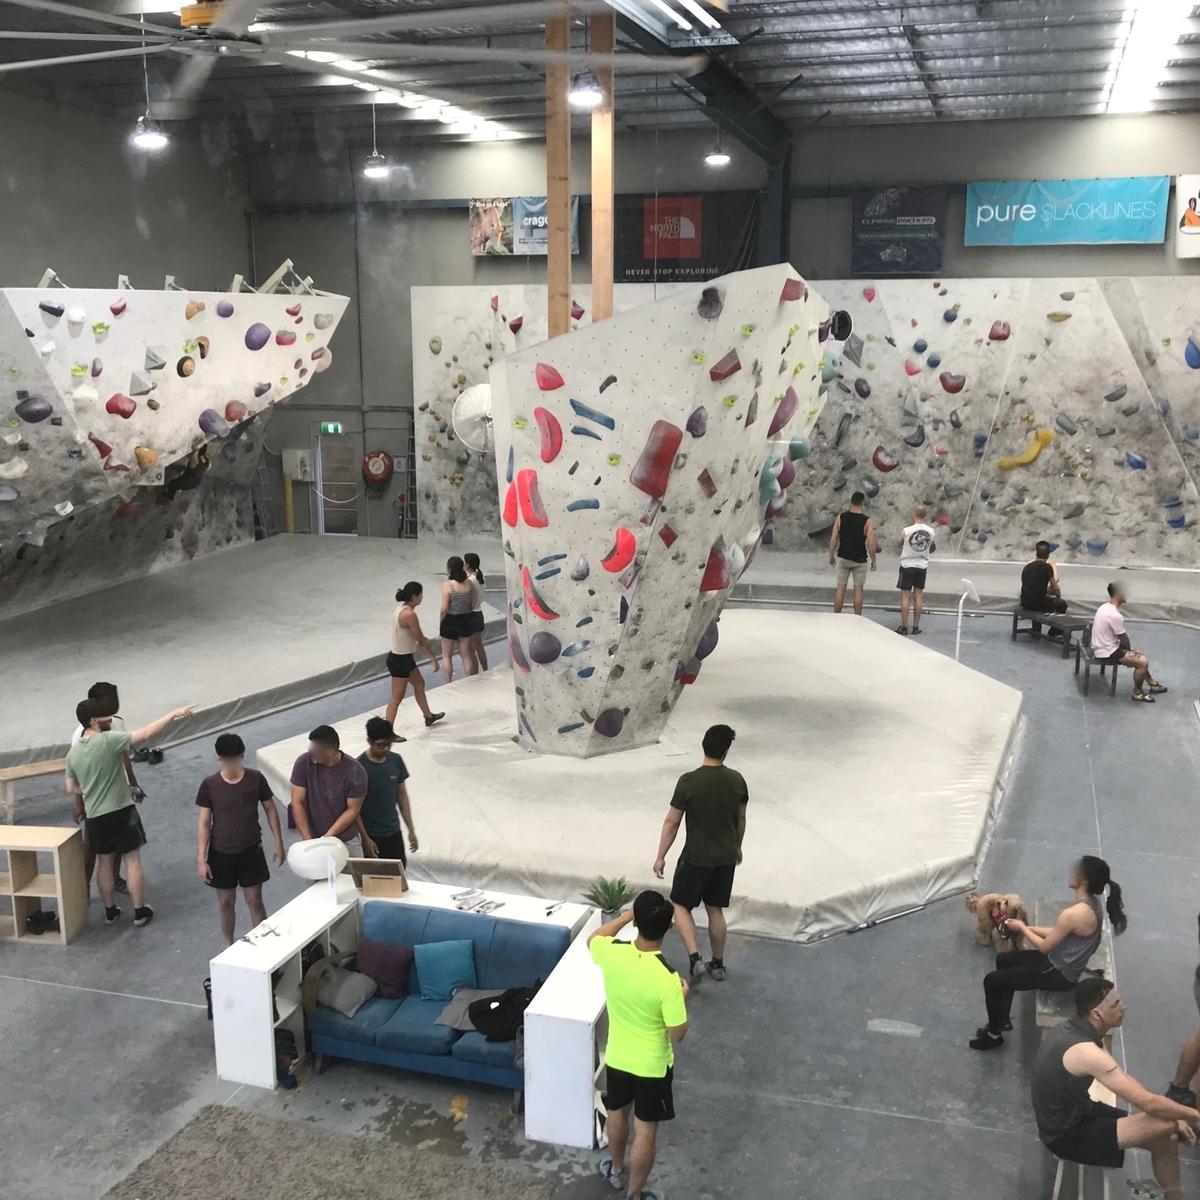 f:id:japaneseclimber:20191027090837j:plain